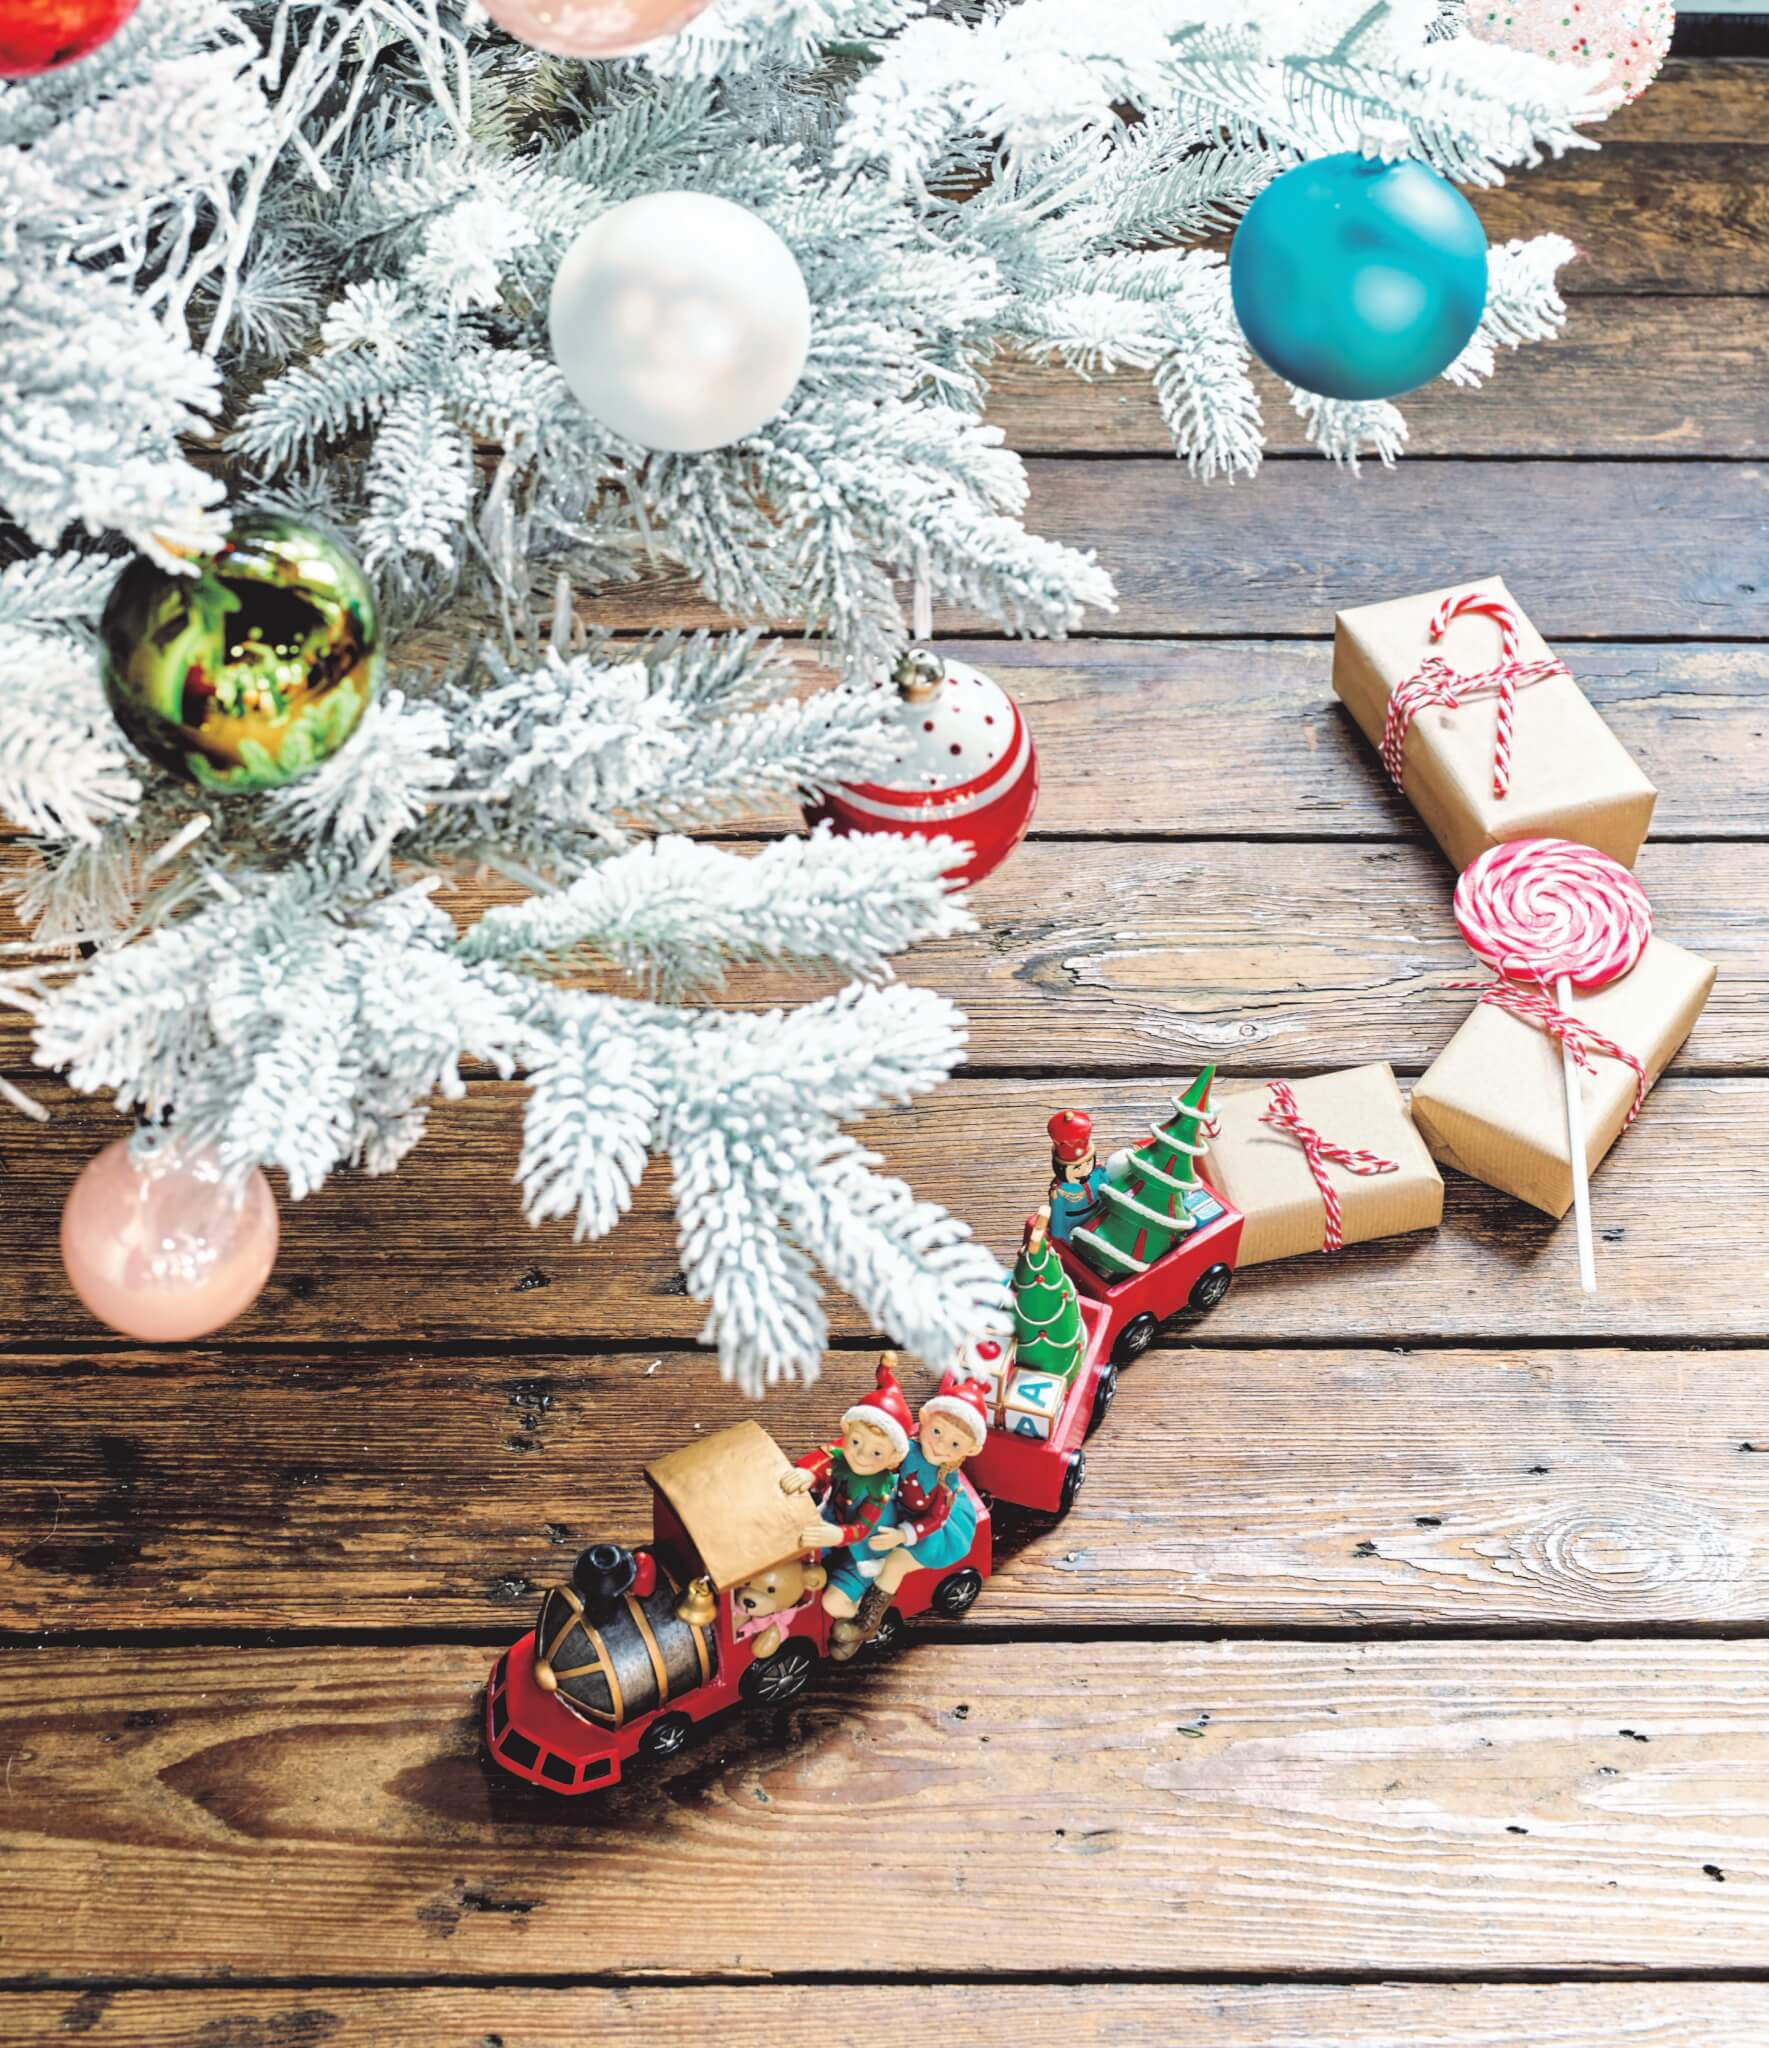 Kerstdecoratie   December to remember (2)